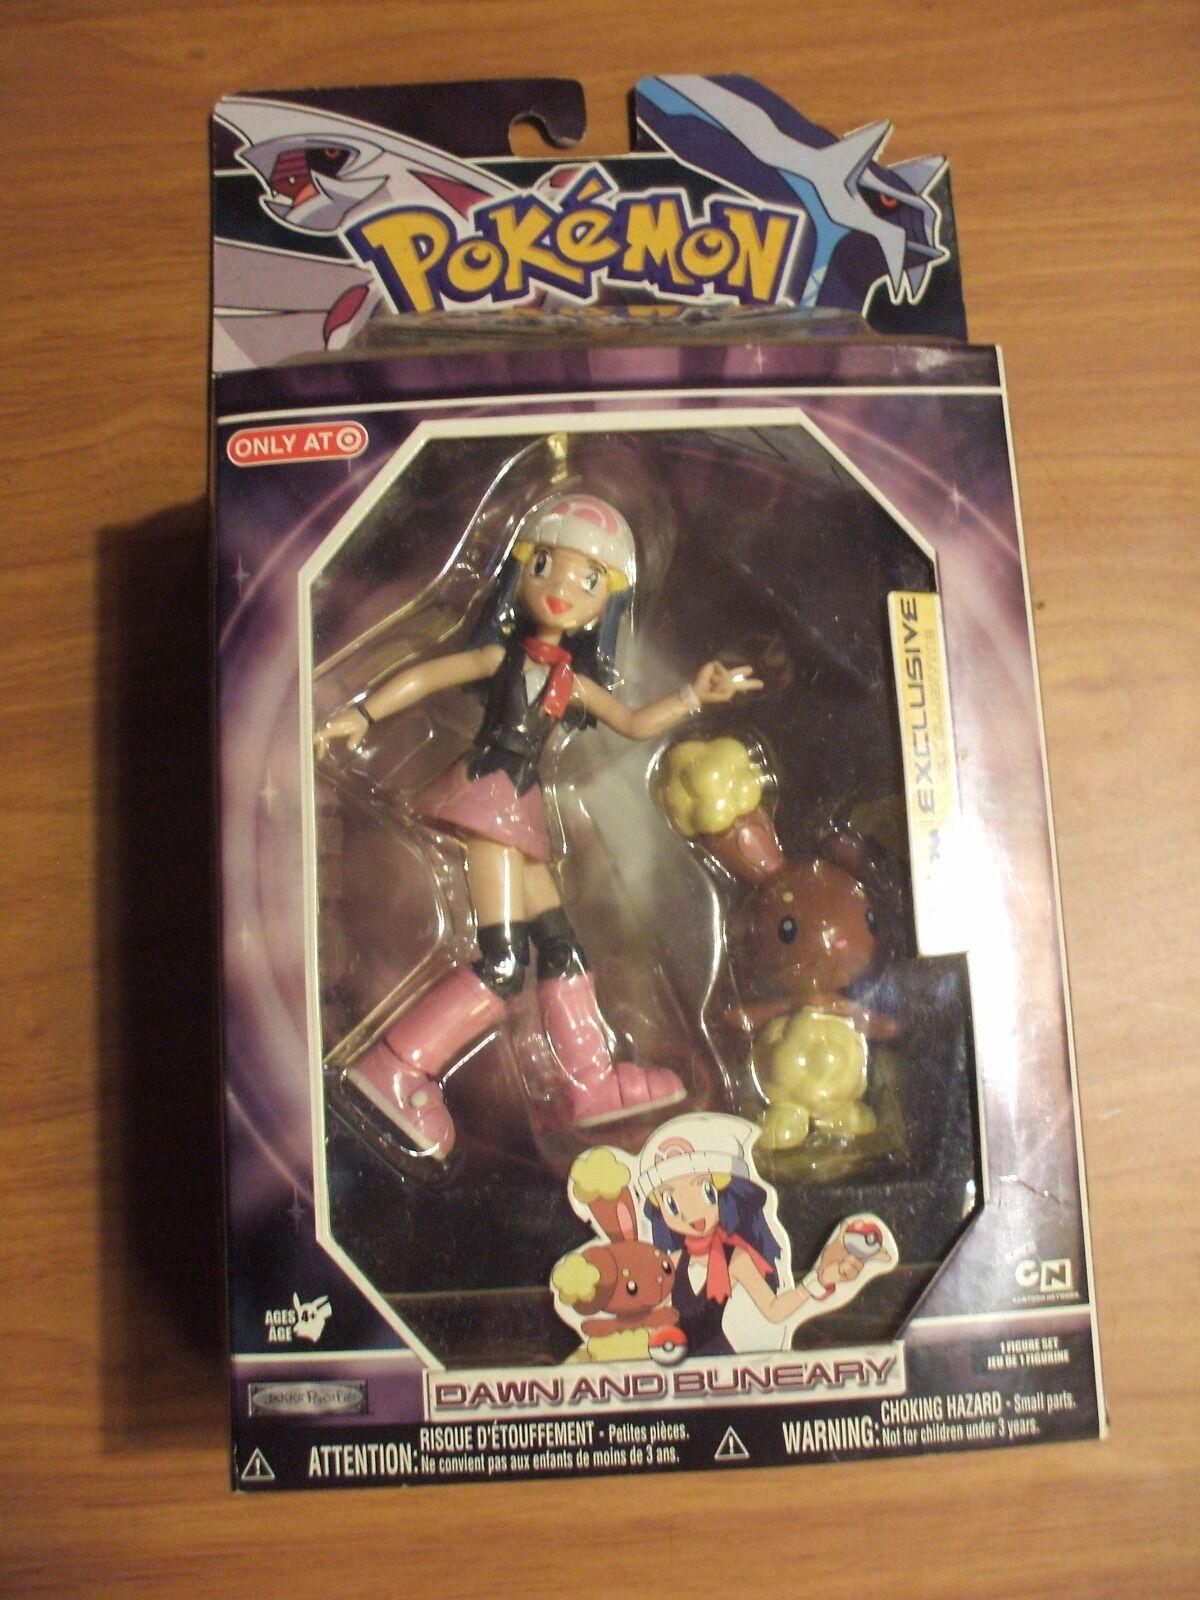 Pokemon Diamond And Pearl Trainer Action Figure Toy Set Dawn Buneary Rare htf